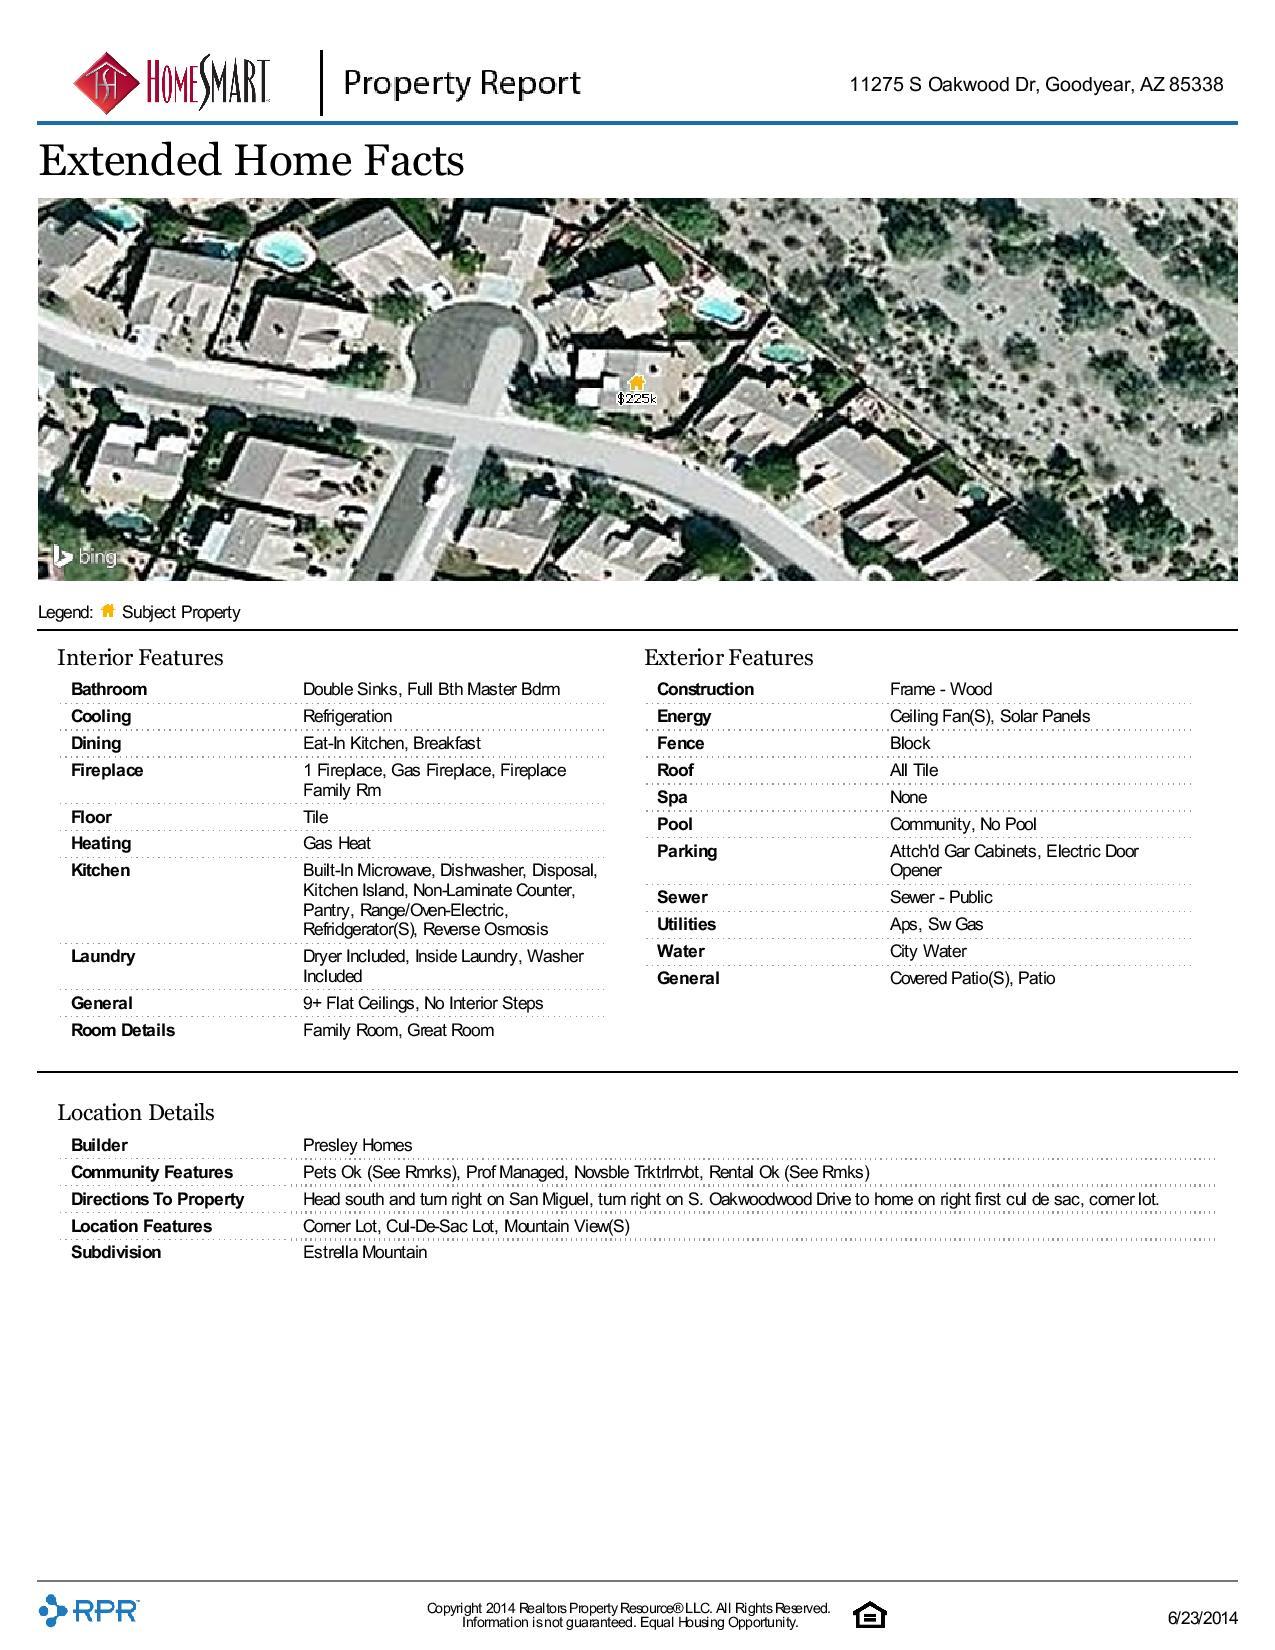 11275-S-Oakwood-Dr-Goodyear-AZ-85338-page-004